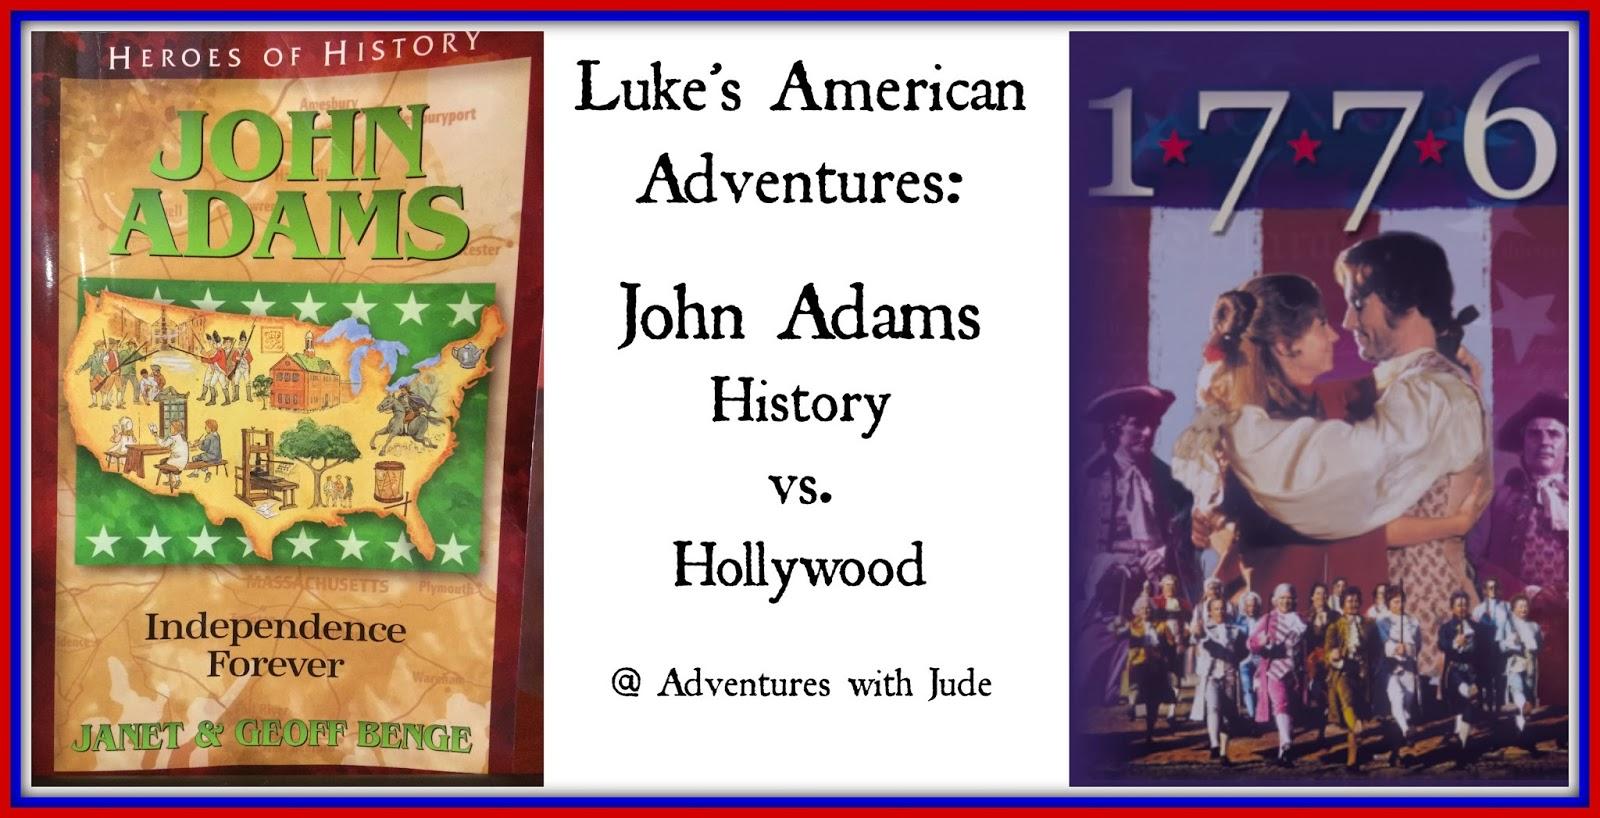 John Adams: History versus Hollywood